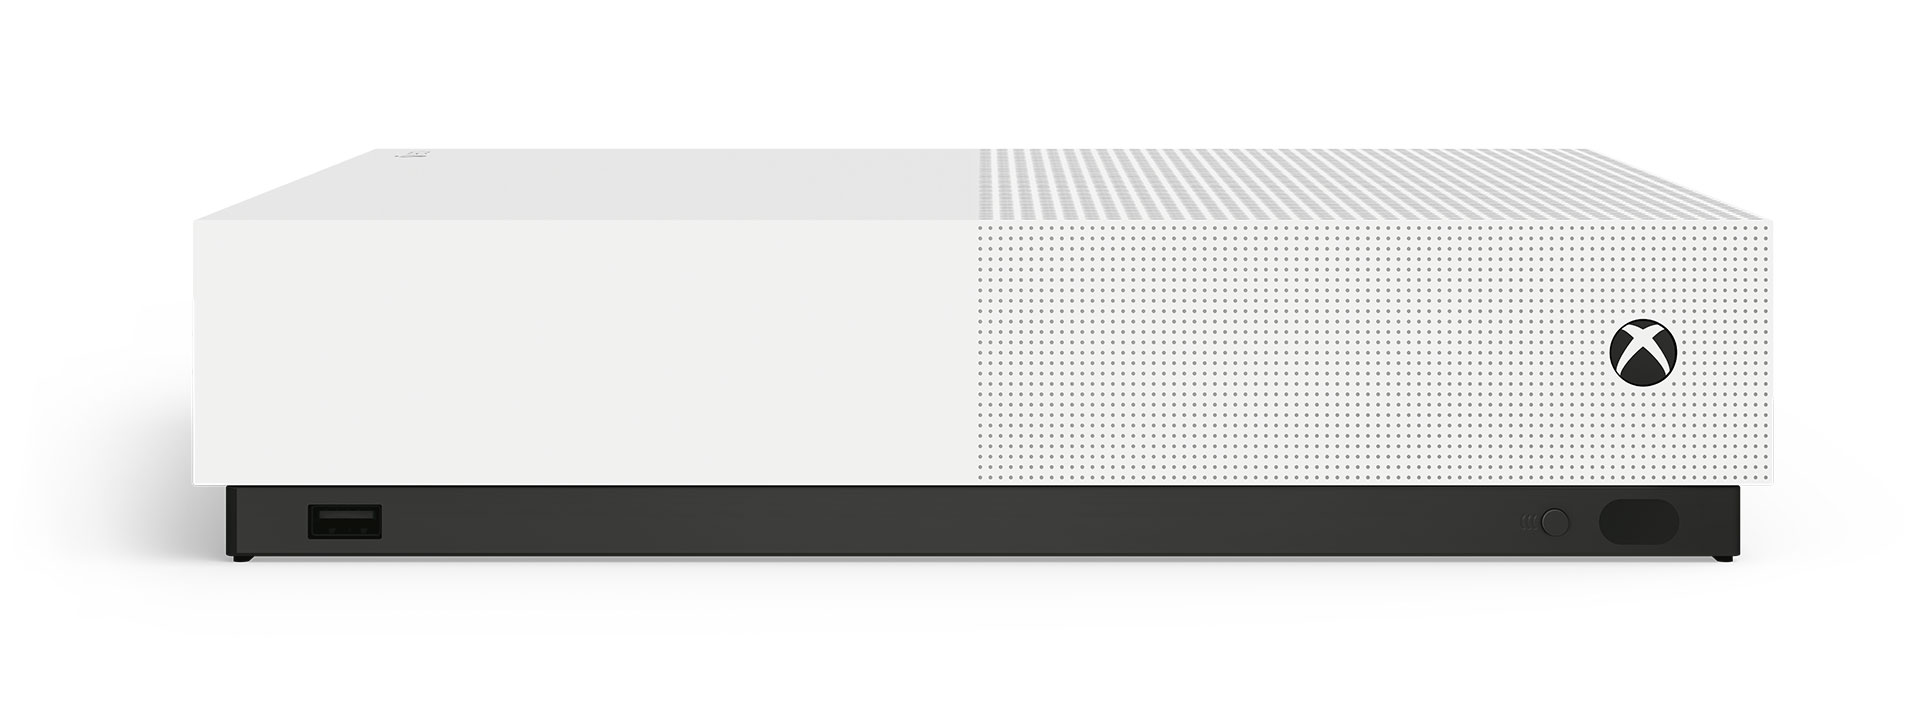 Xbox One S-konsol med en Xbox trådlös handkontroll